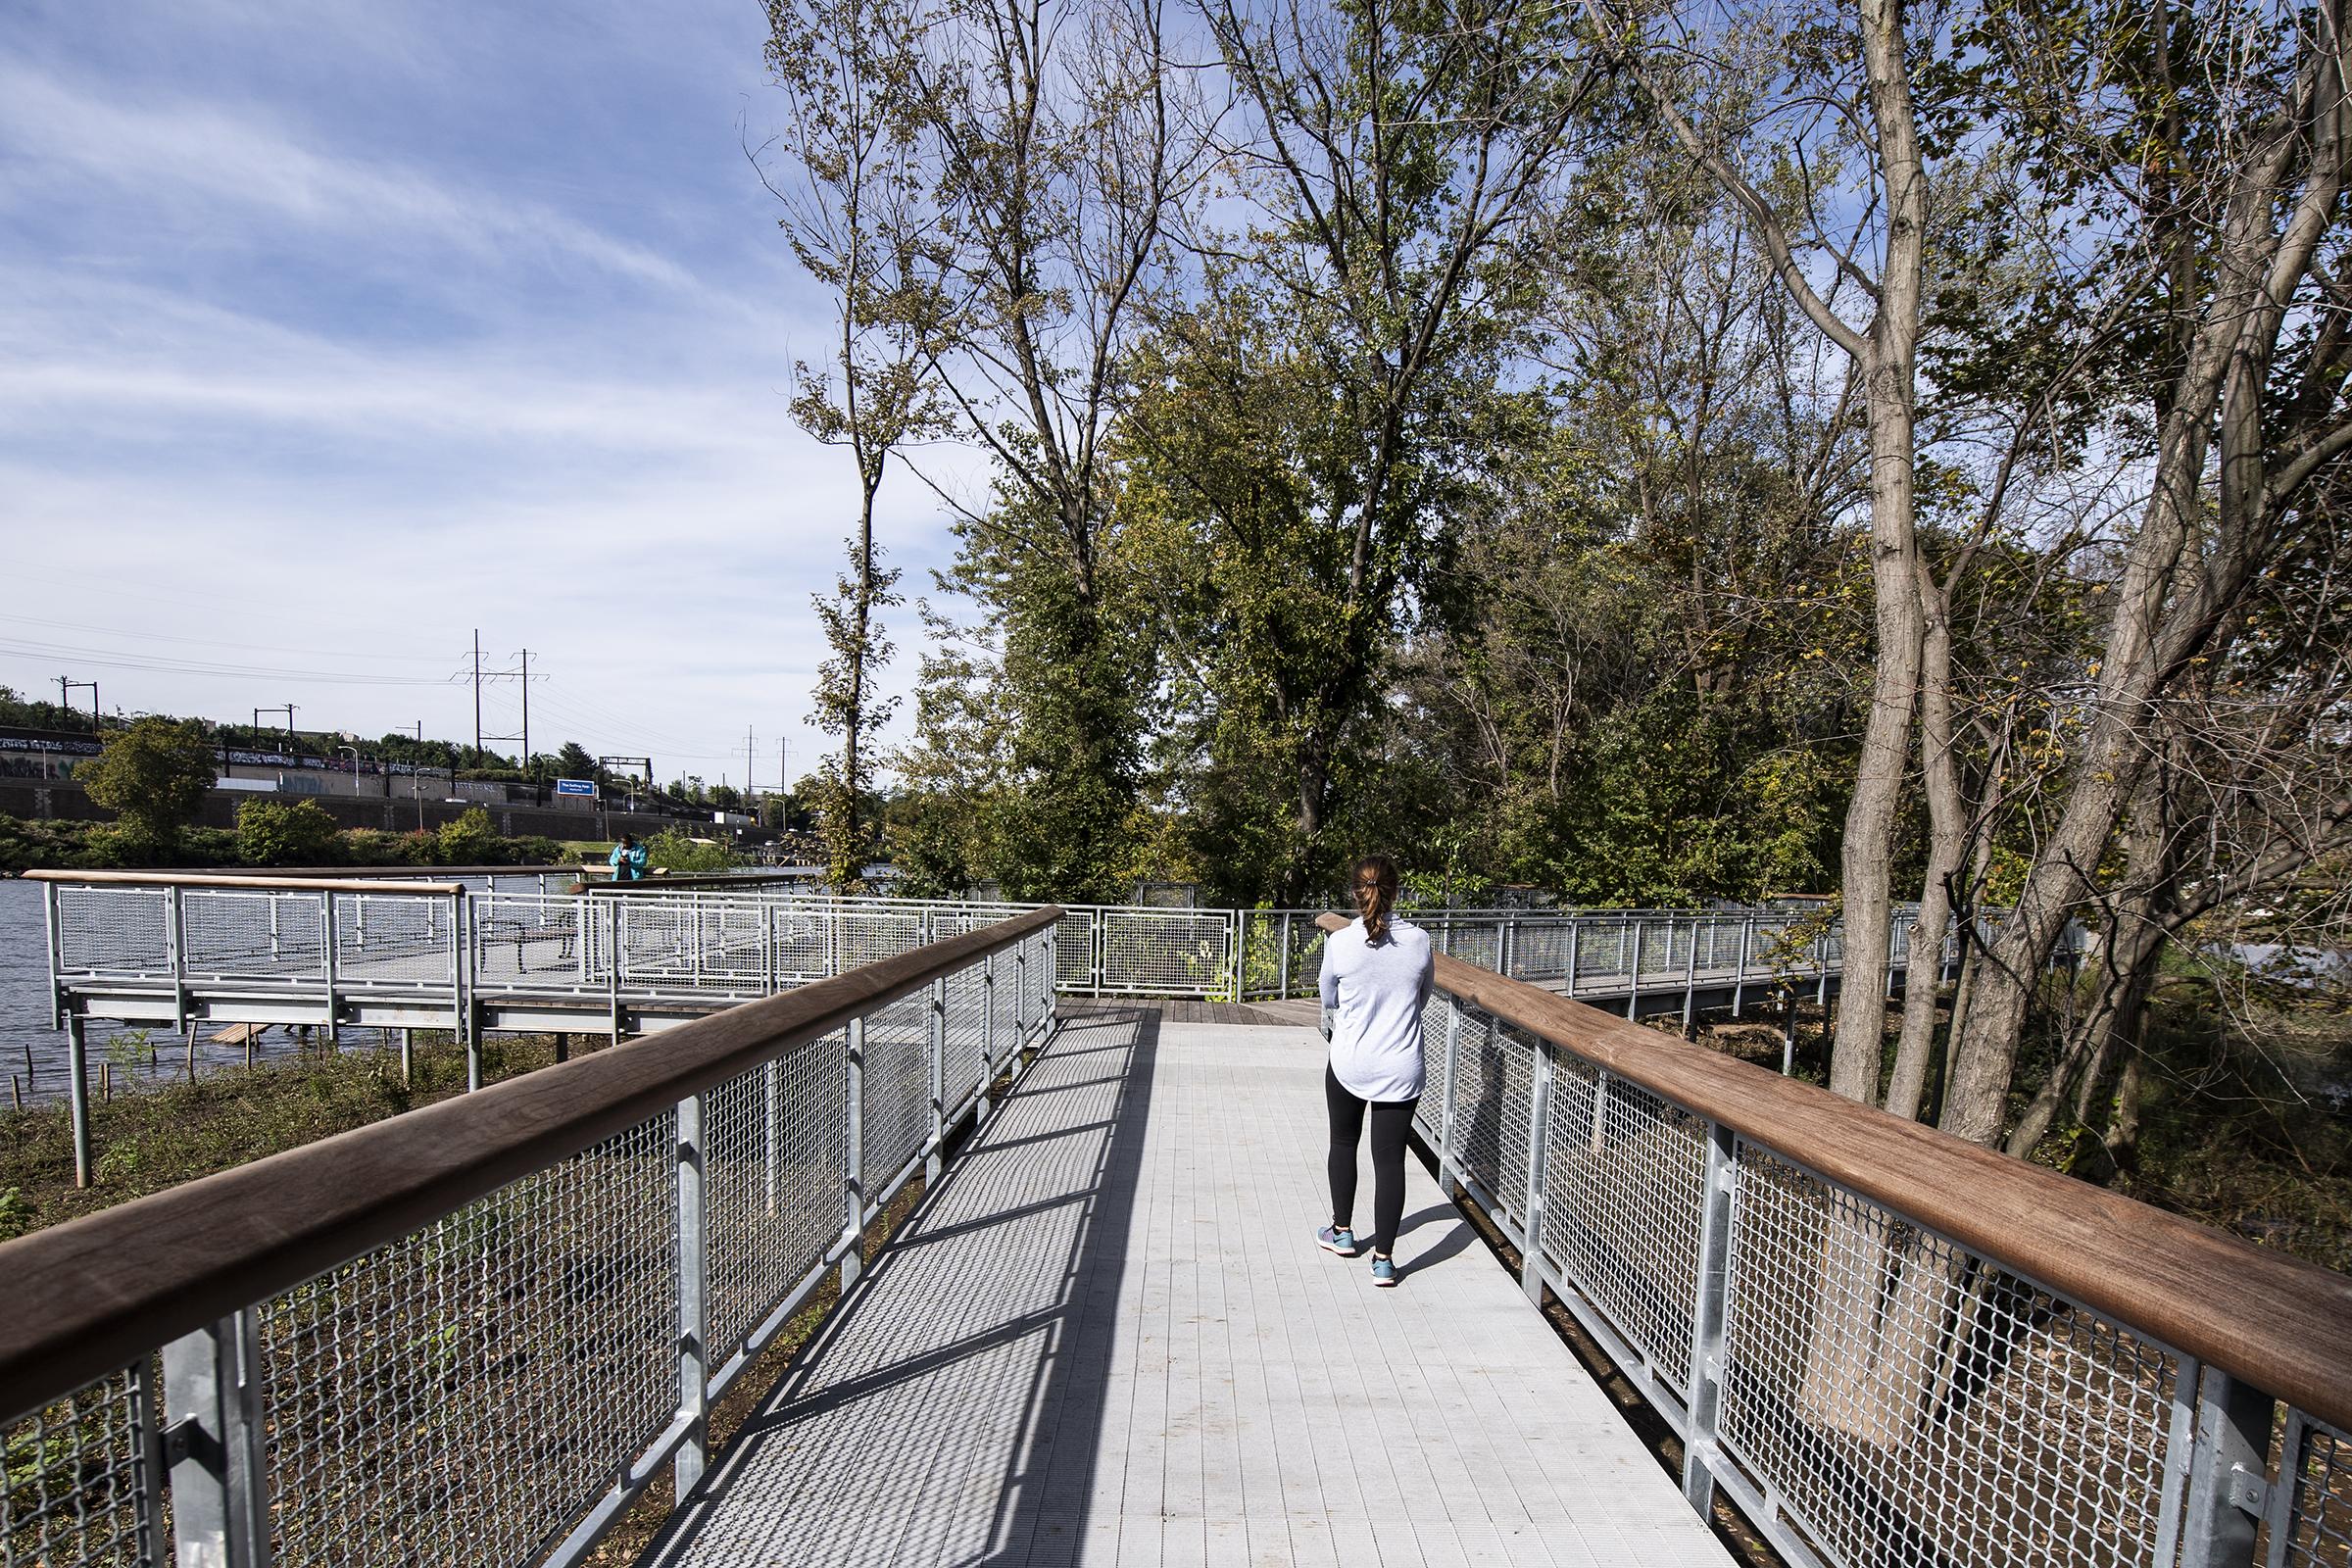 A woman walks on the bridge of the Philadelphia Parks & RecreationÕs Fairmount Water Works Boardwalk and Trail at Boathouse Row, Philadelphia, PA. Tuesday, October 16, 2018. JOSE F. MORENO / Staff Photographer.